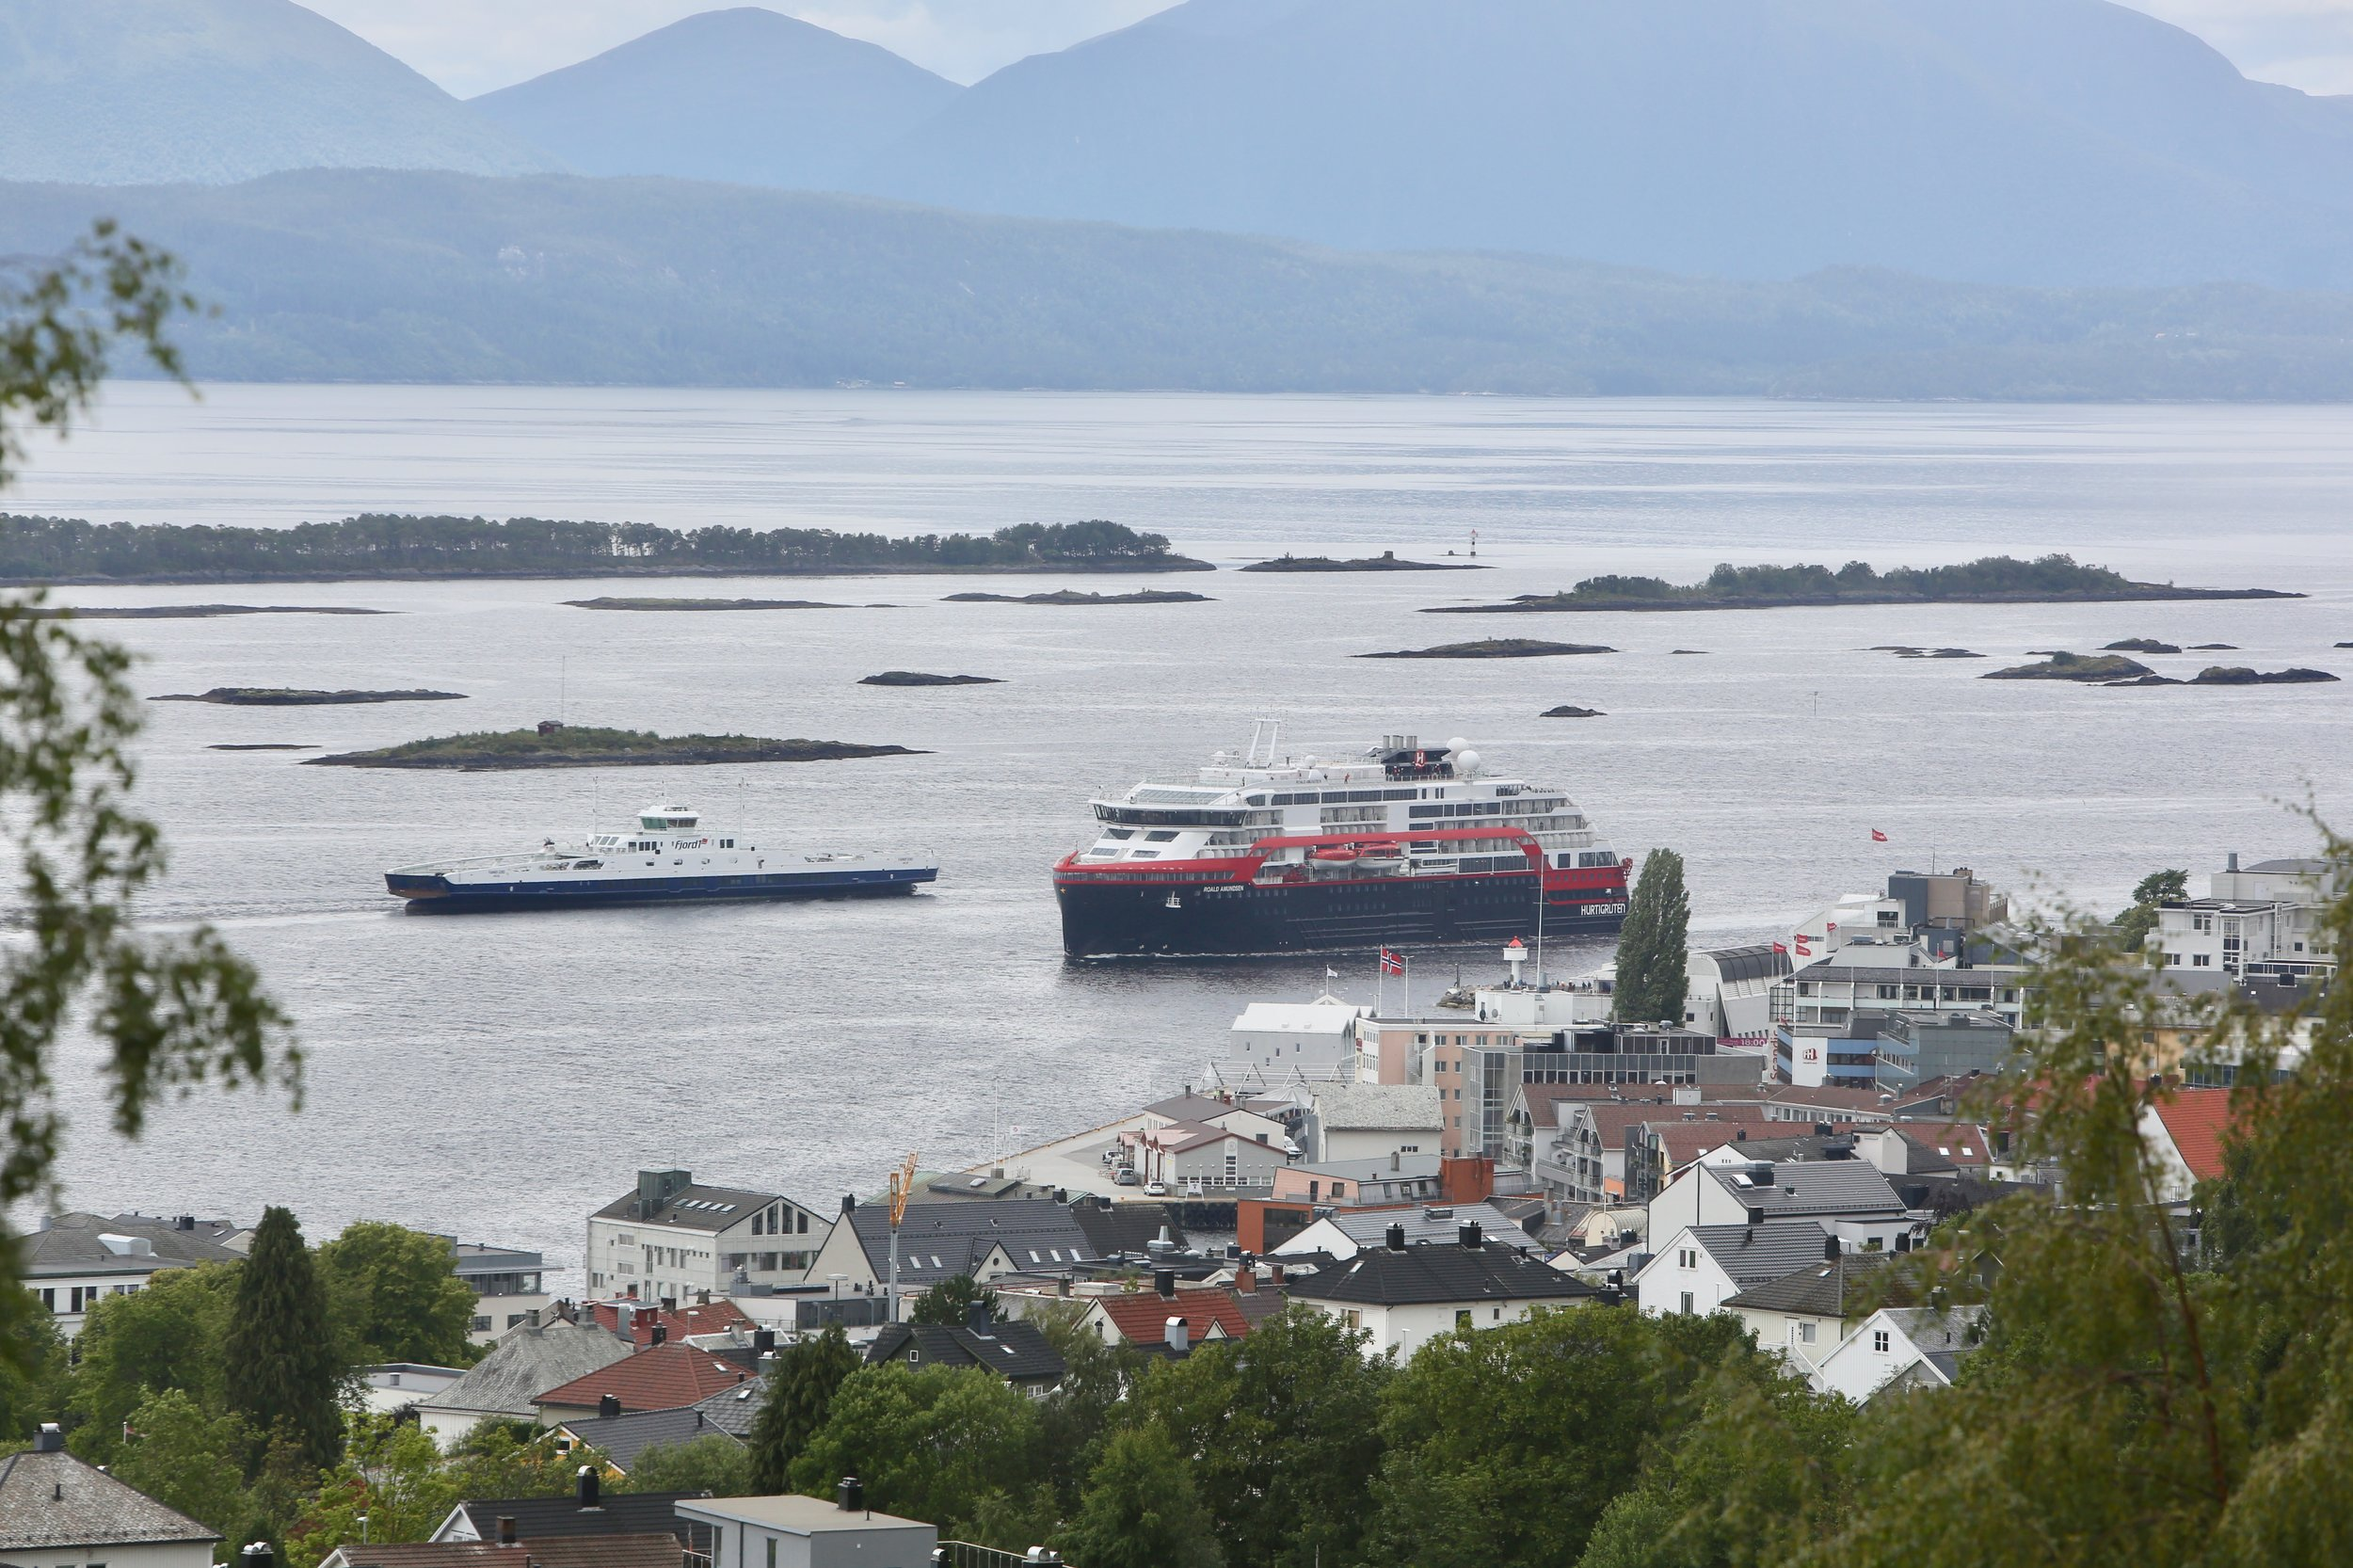 MS Roald Amundsen startet med cruise langs Norskekysten. Foto: Odd Roar Lange